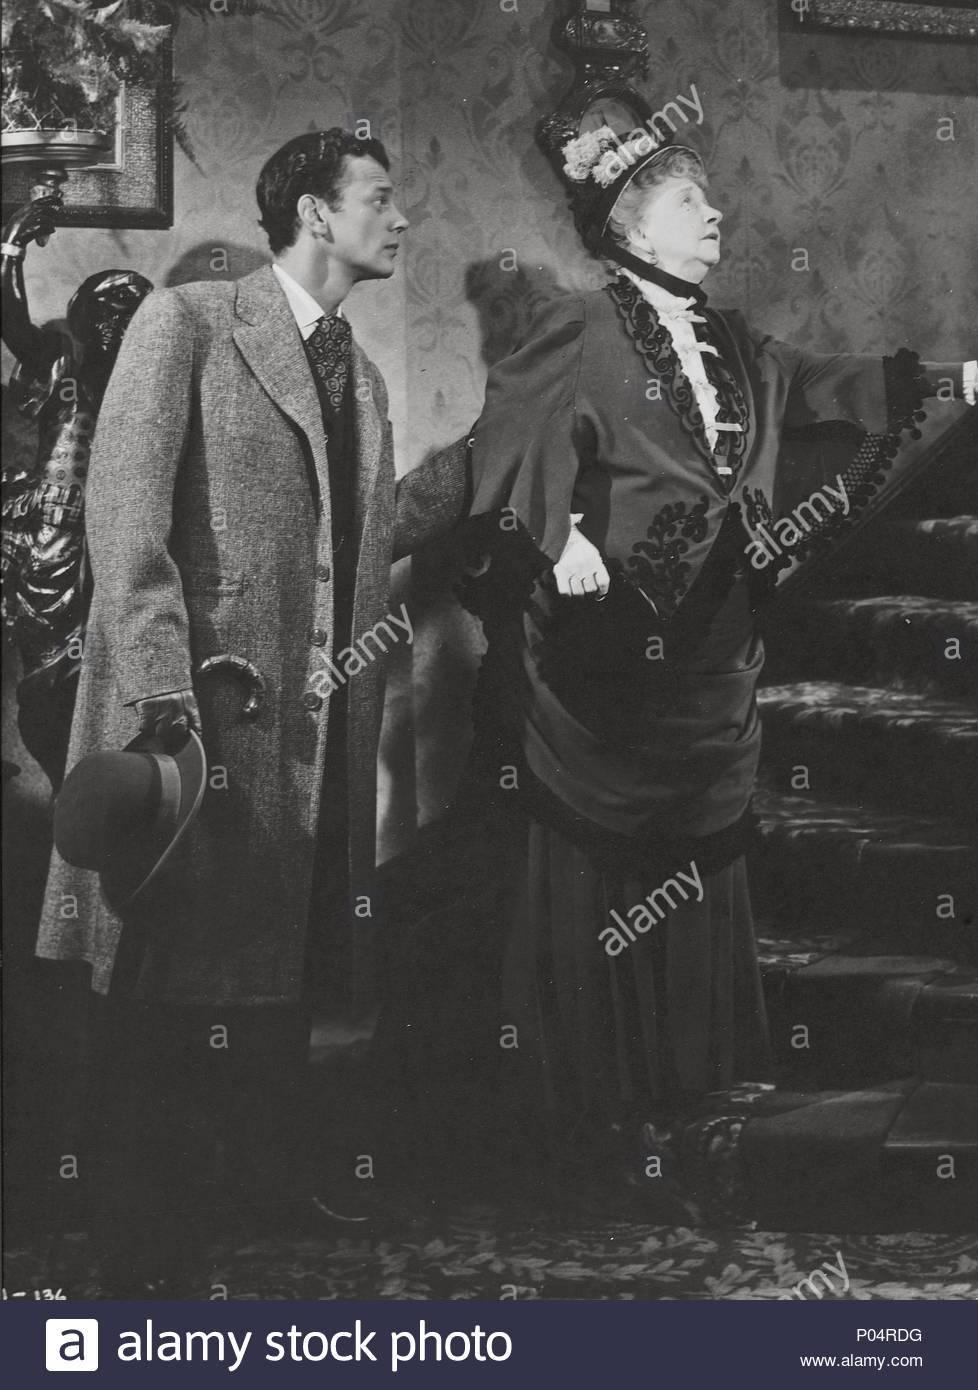 Marius Goring (1912?998),Maggie Fitzgibbon Hot pictures Lois Chiles,Anita Majumdar